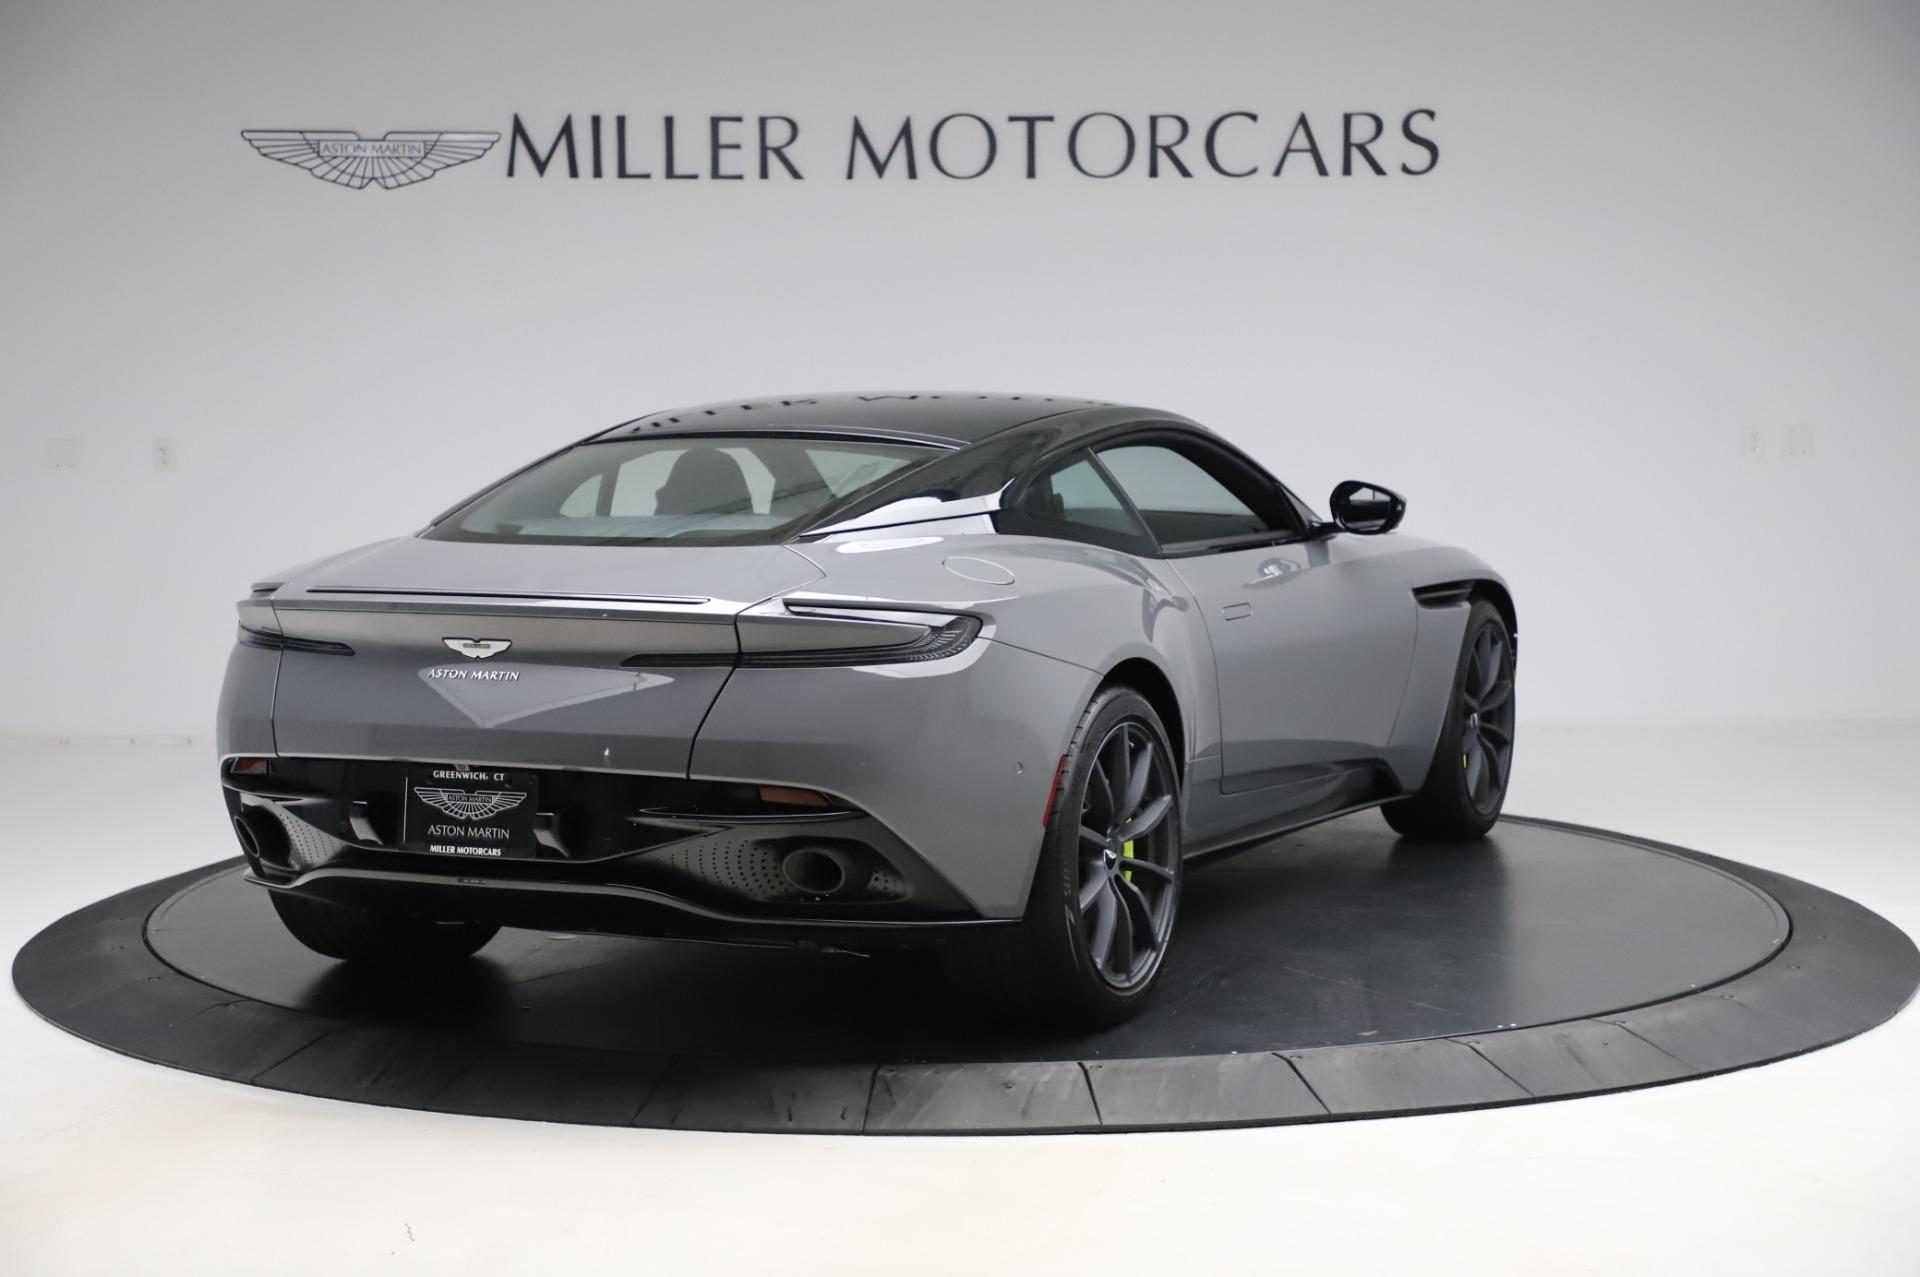 New-2020-Aston-Martin-DB11-V12-AMR-Coupe